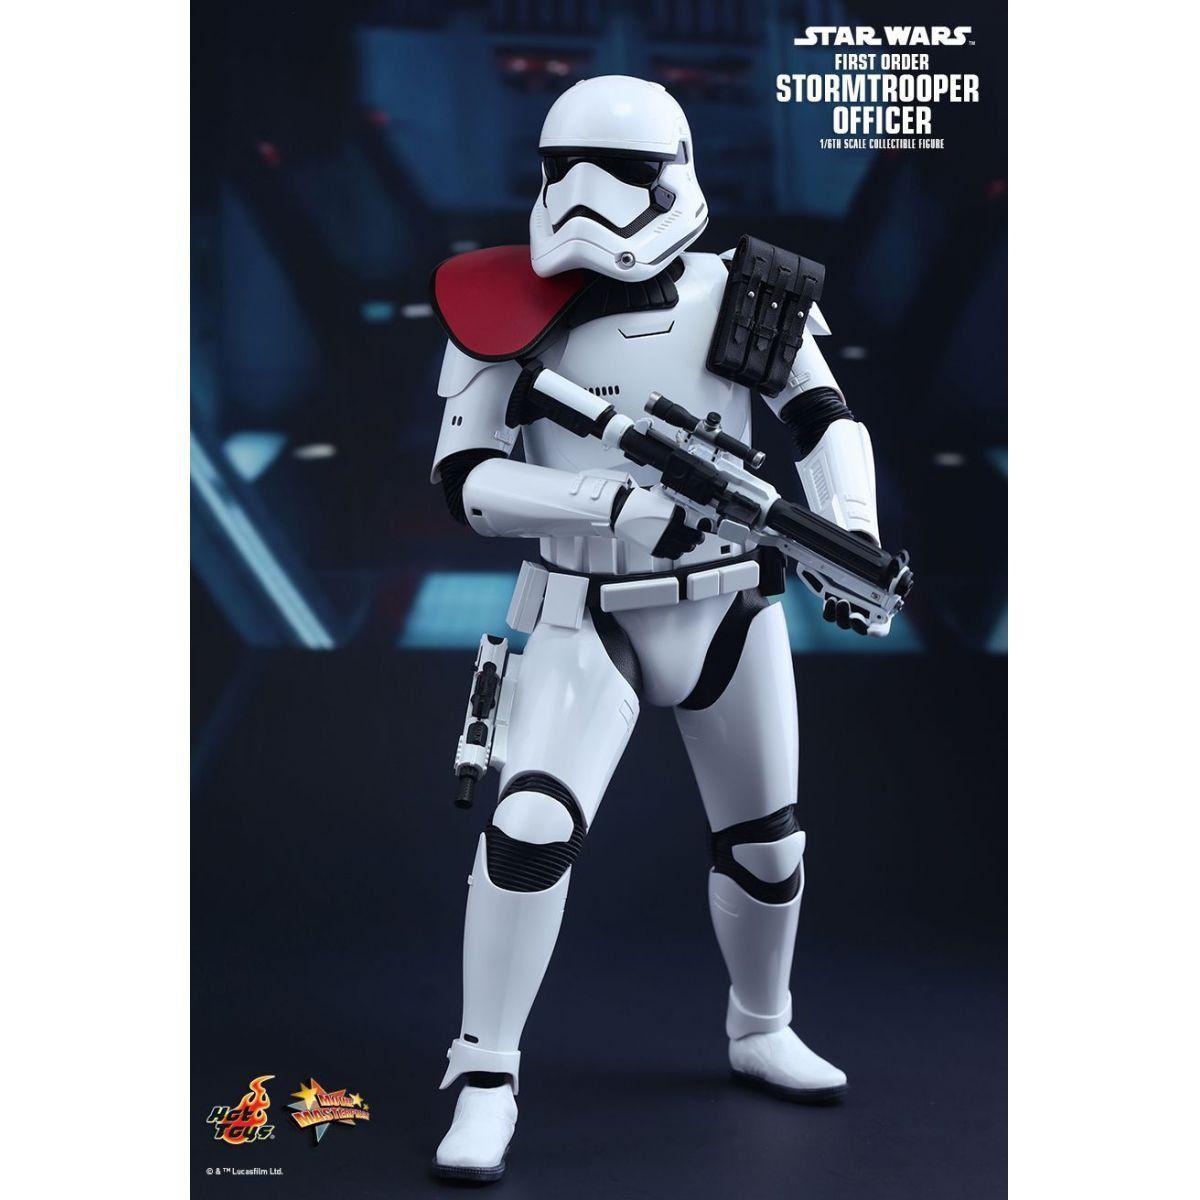 Boneco First Order Stormtrooper Officer: Star Wars: O Despertar da Força Escala 1/6 (MMS334) - Hot Toys - CD